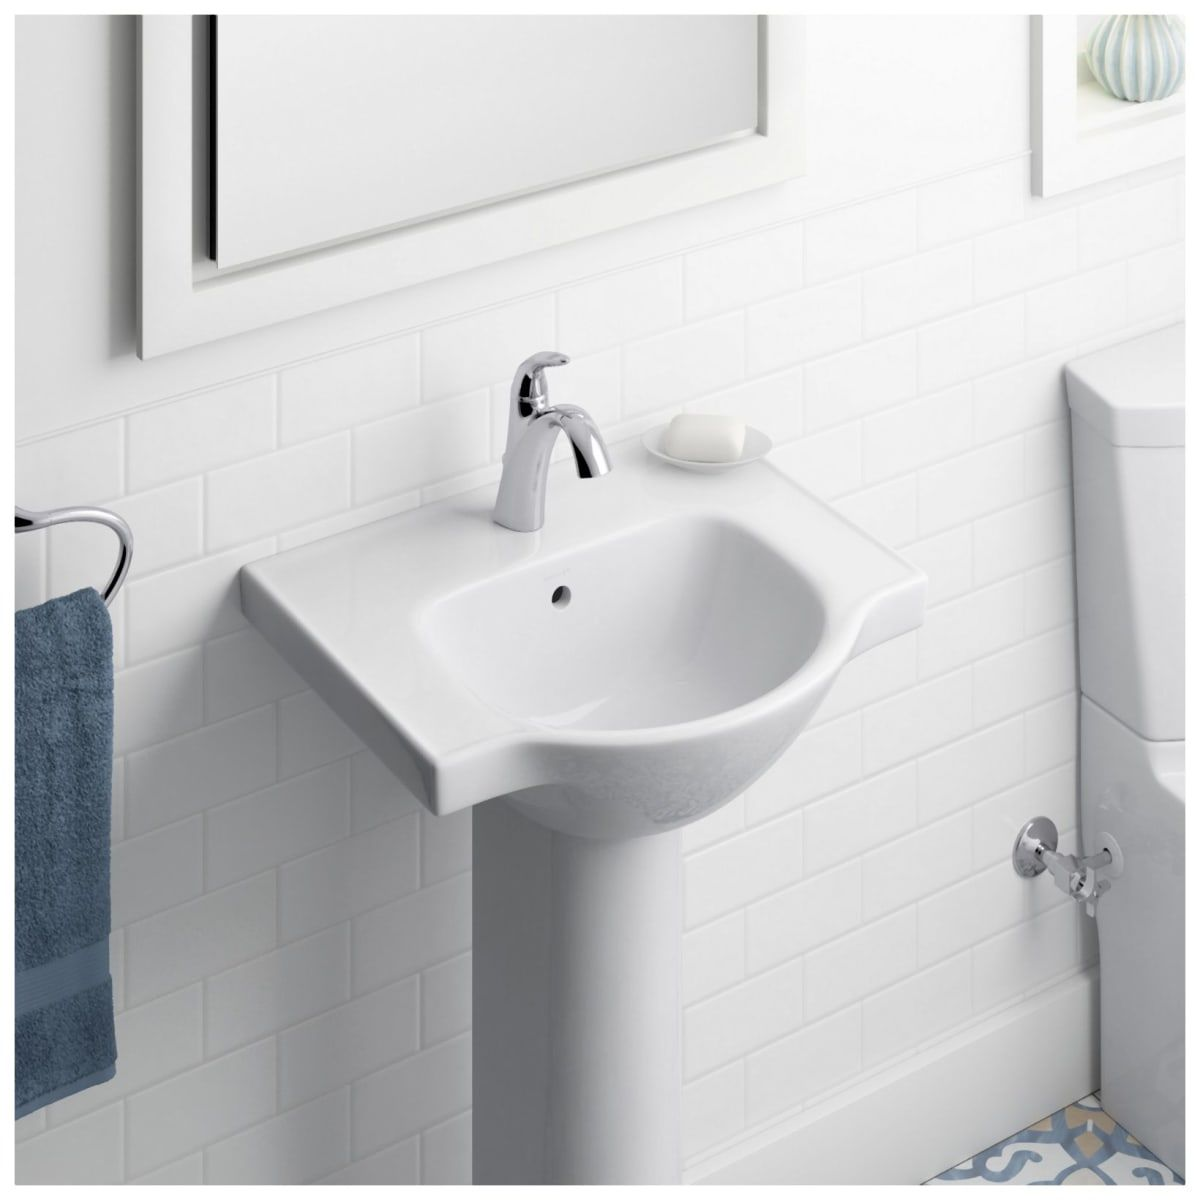 Kohler K 5247 1 0 White Veer 21 Pedestal Bathroom Sink With One